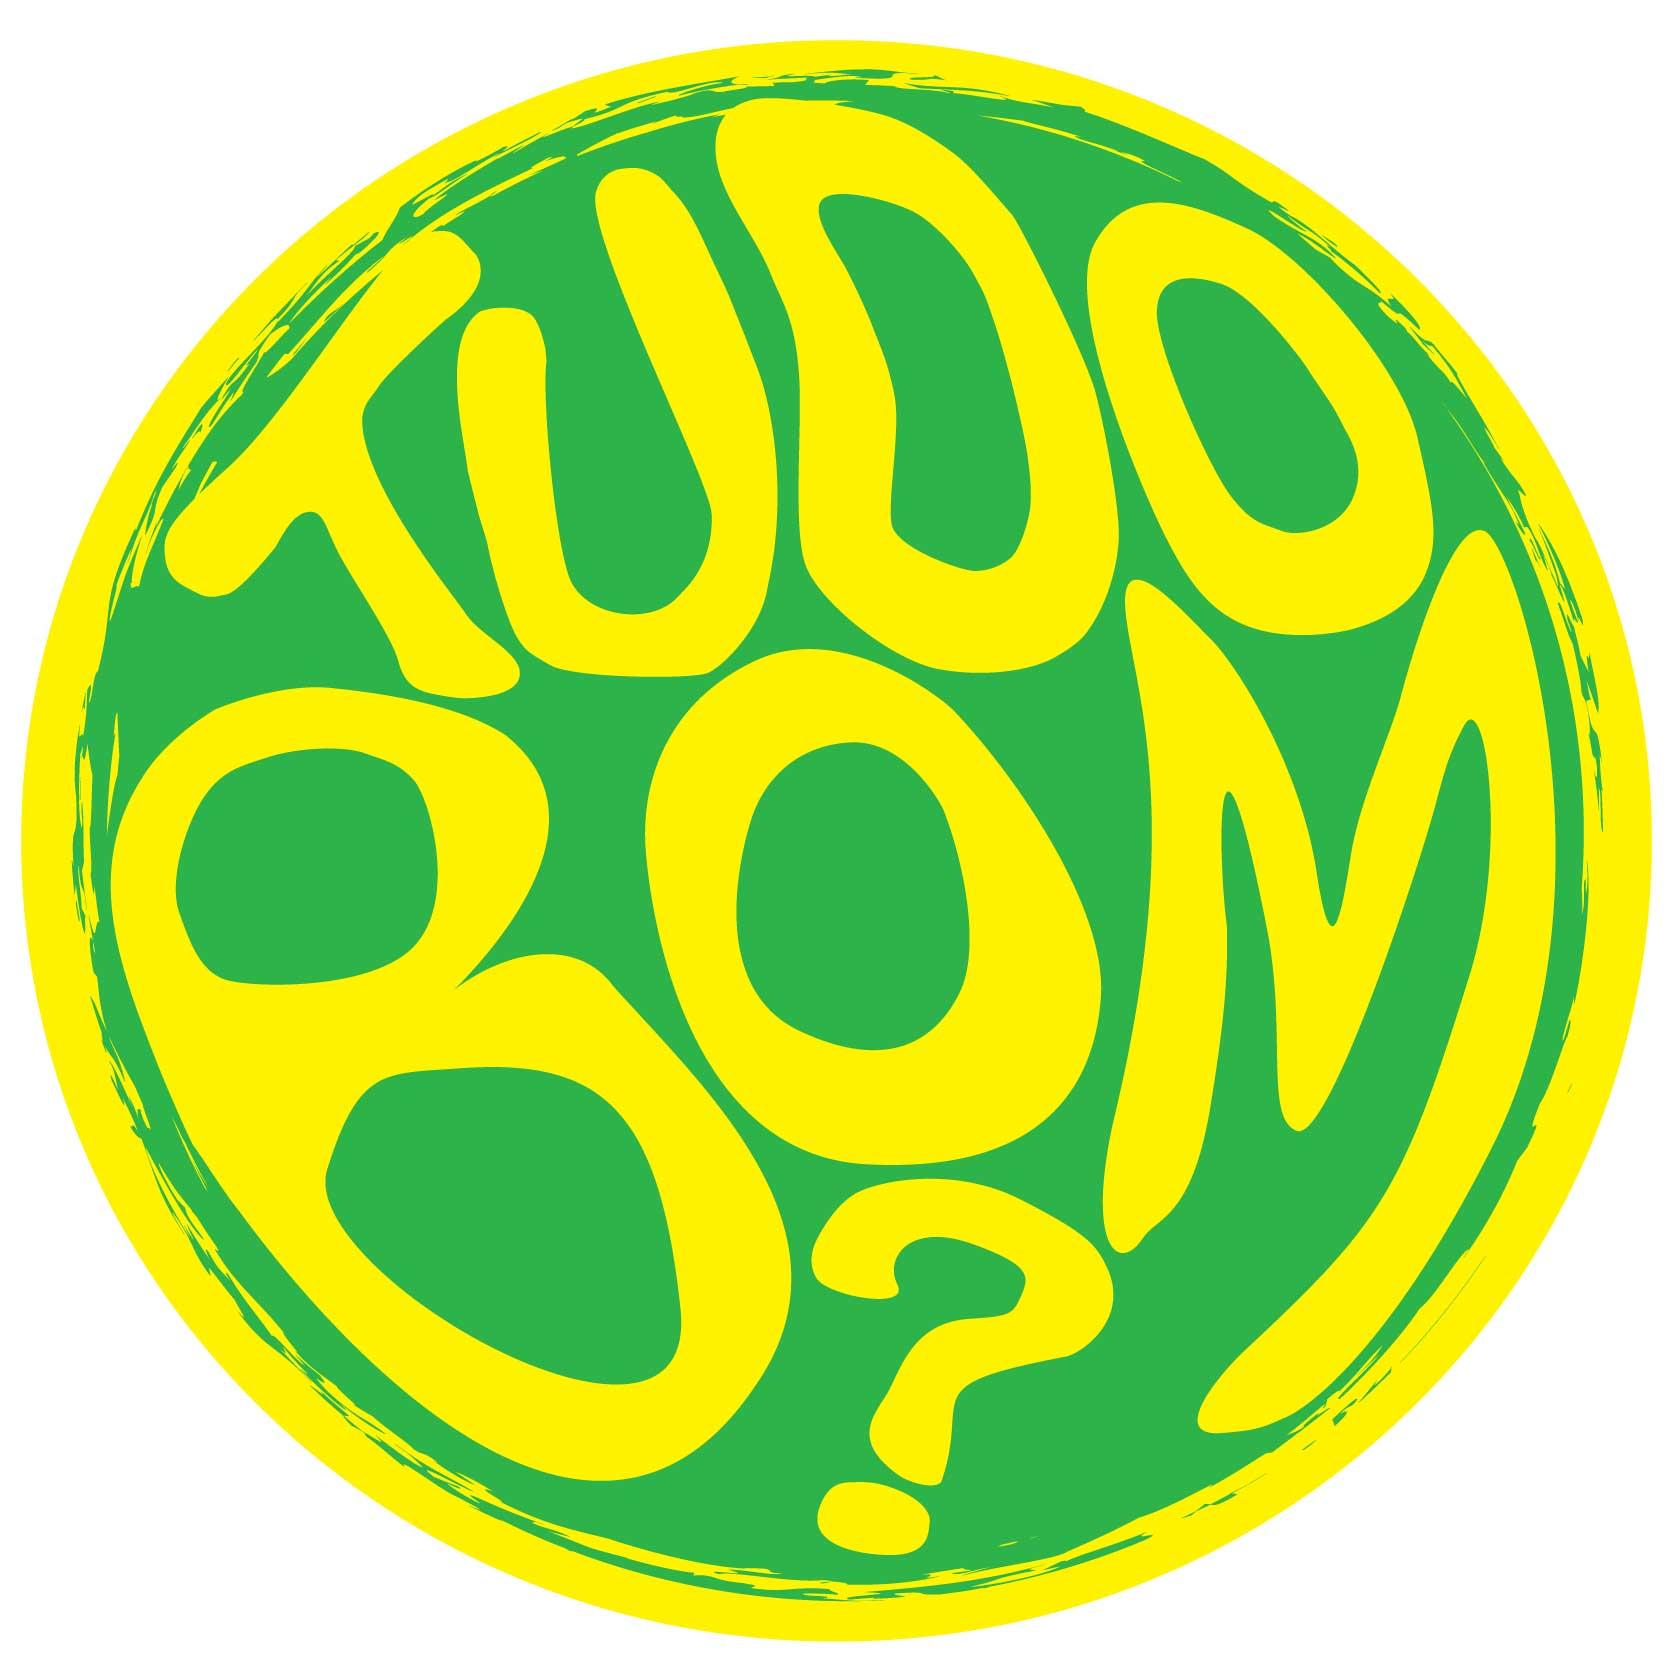 TudoBom?